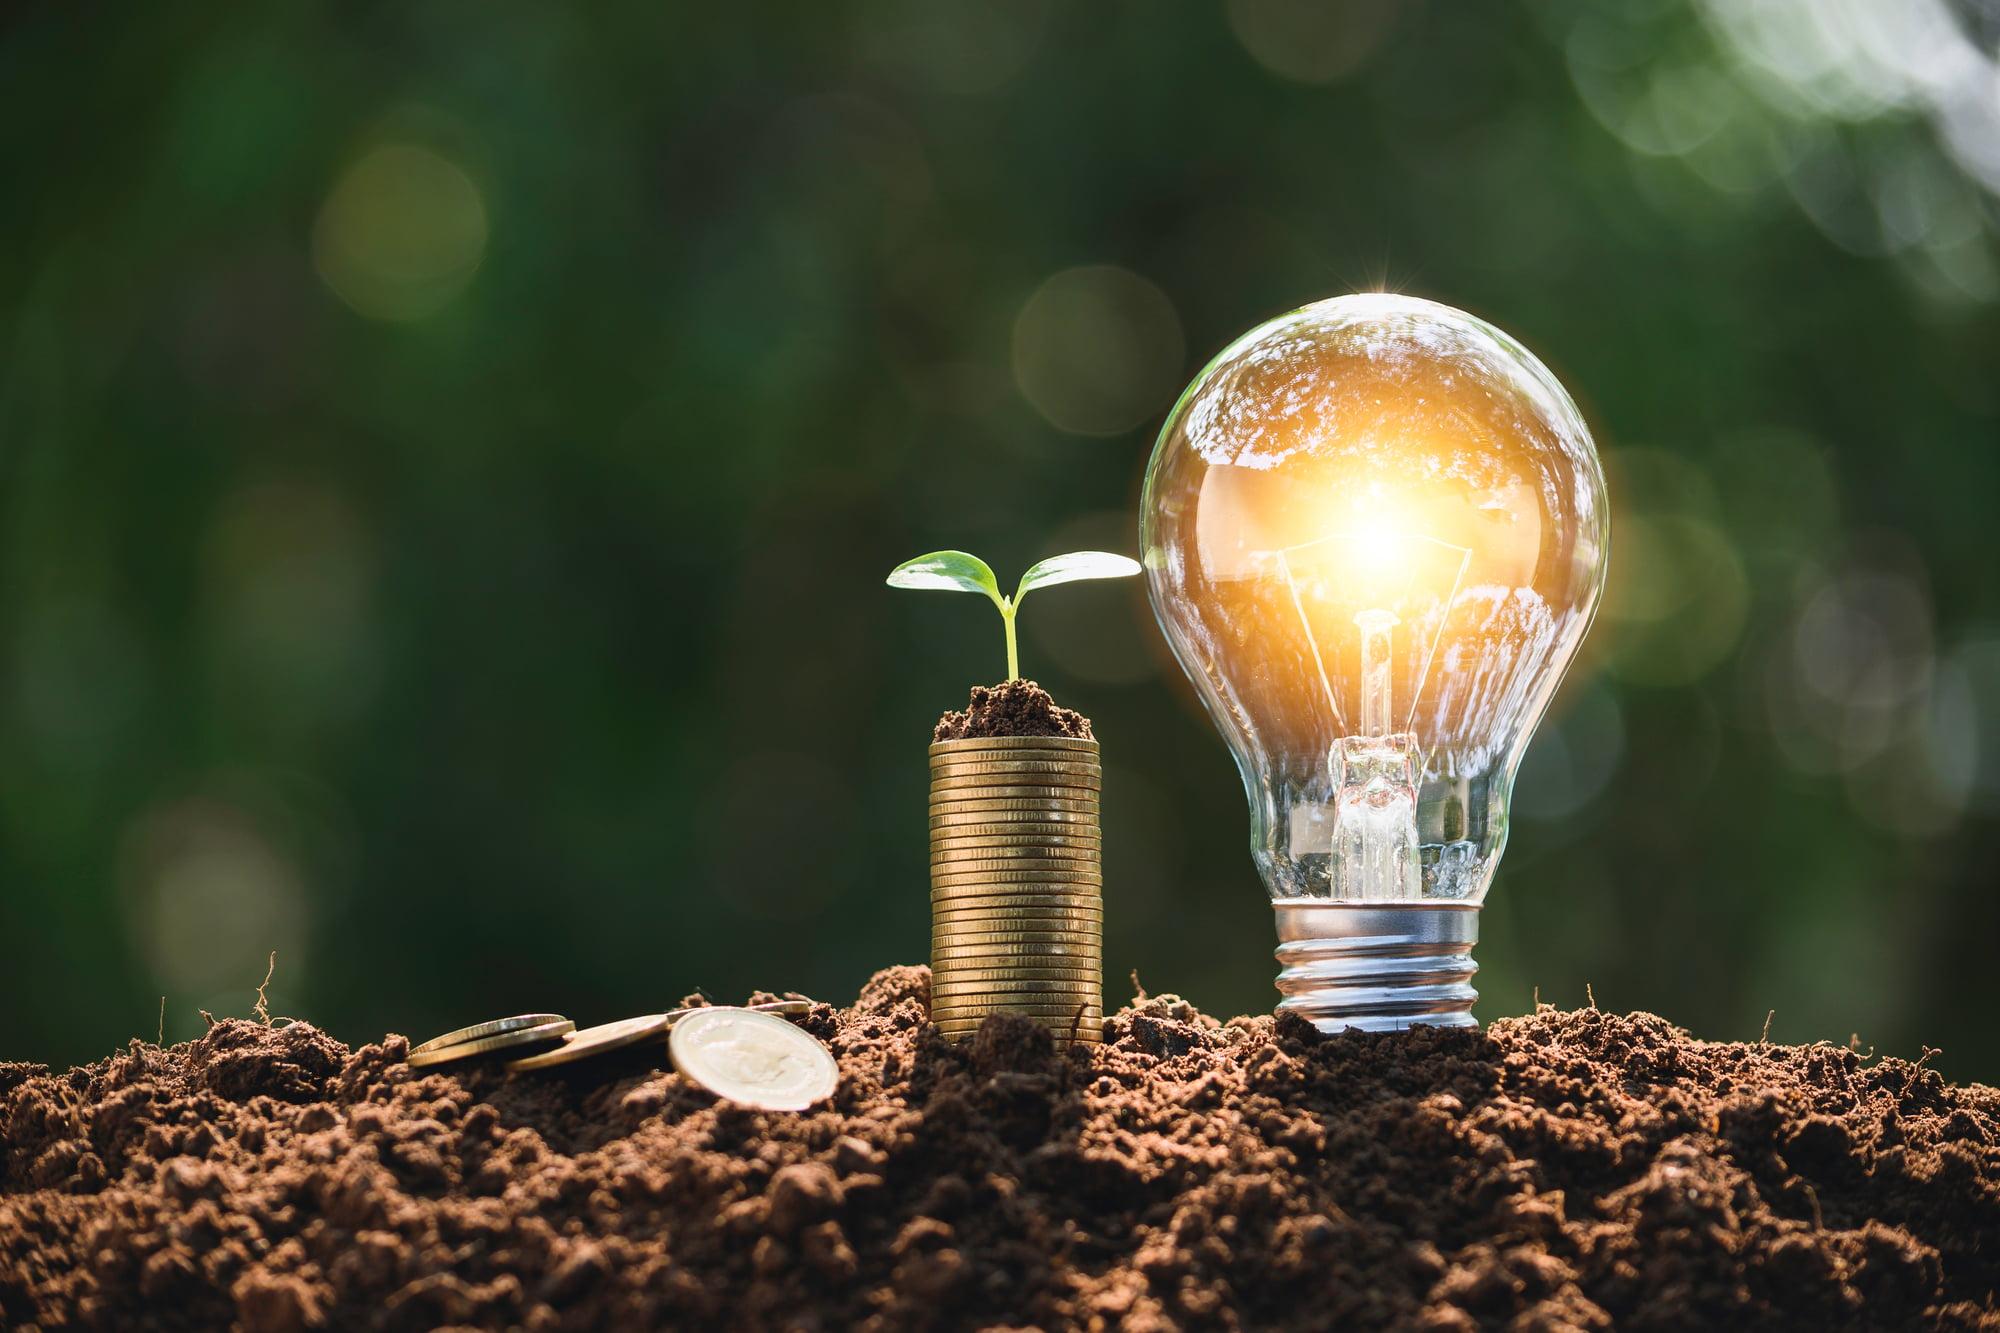 Prices-Vs-Savings-of-Going-Solar